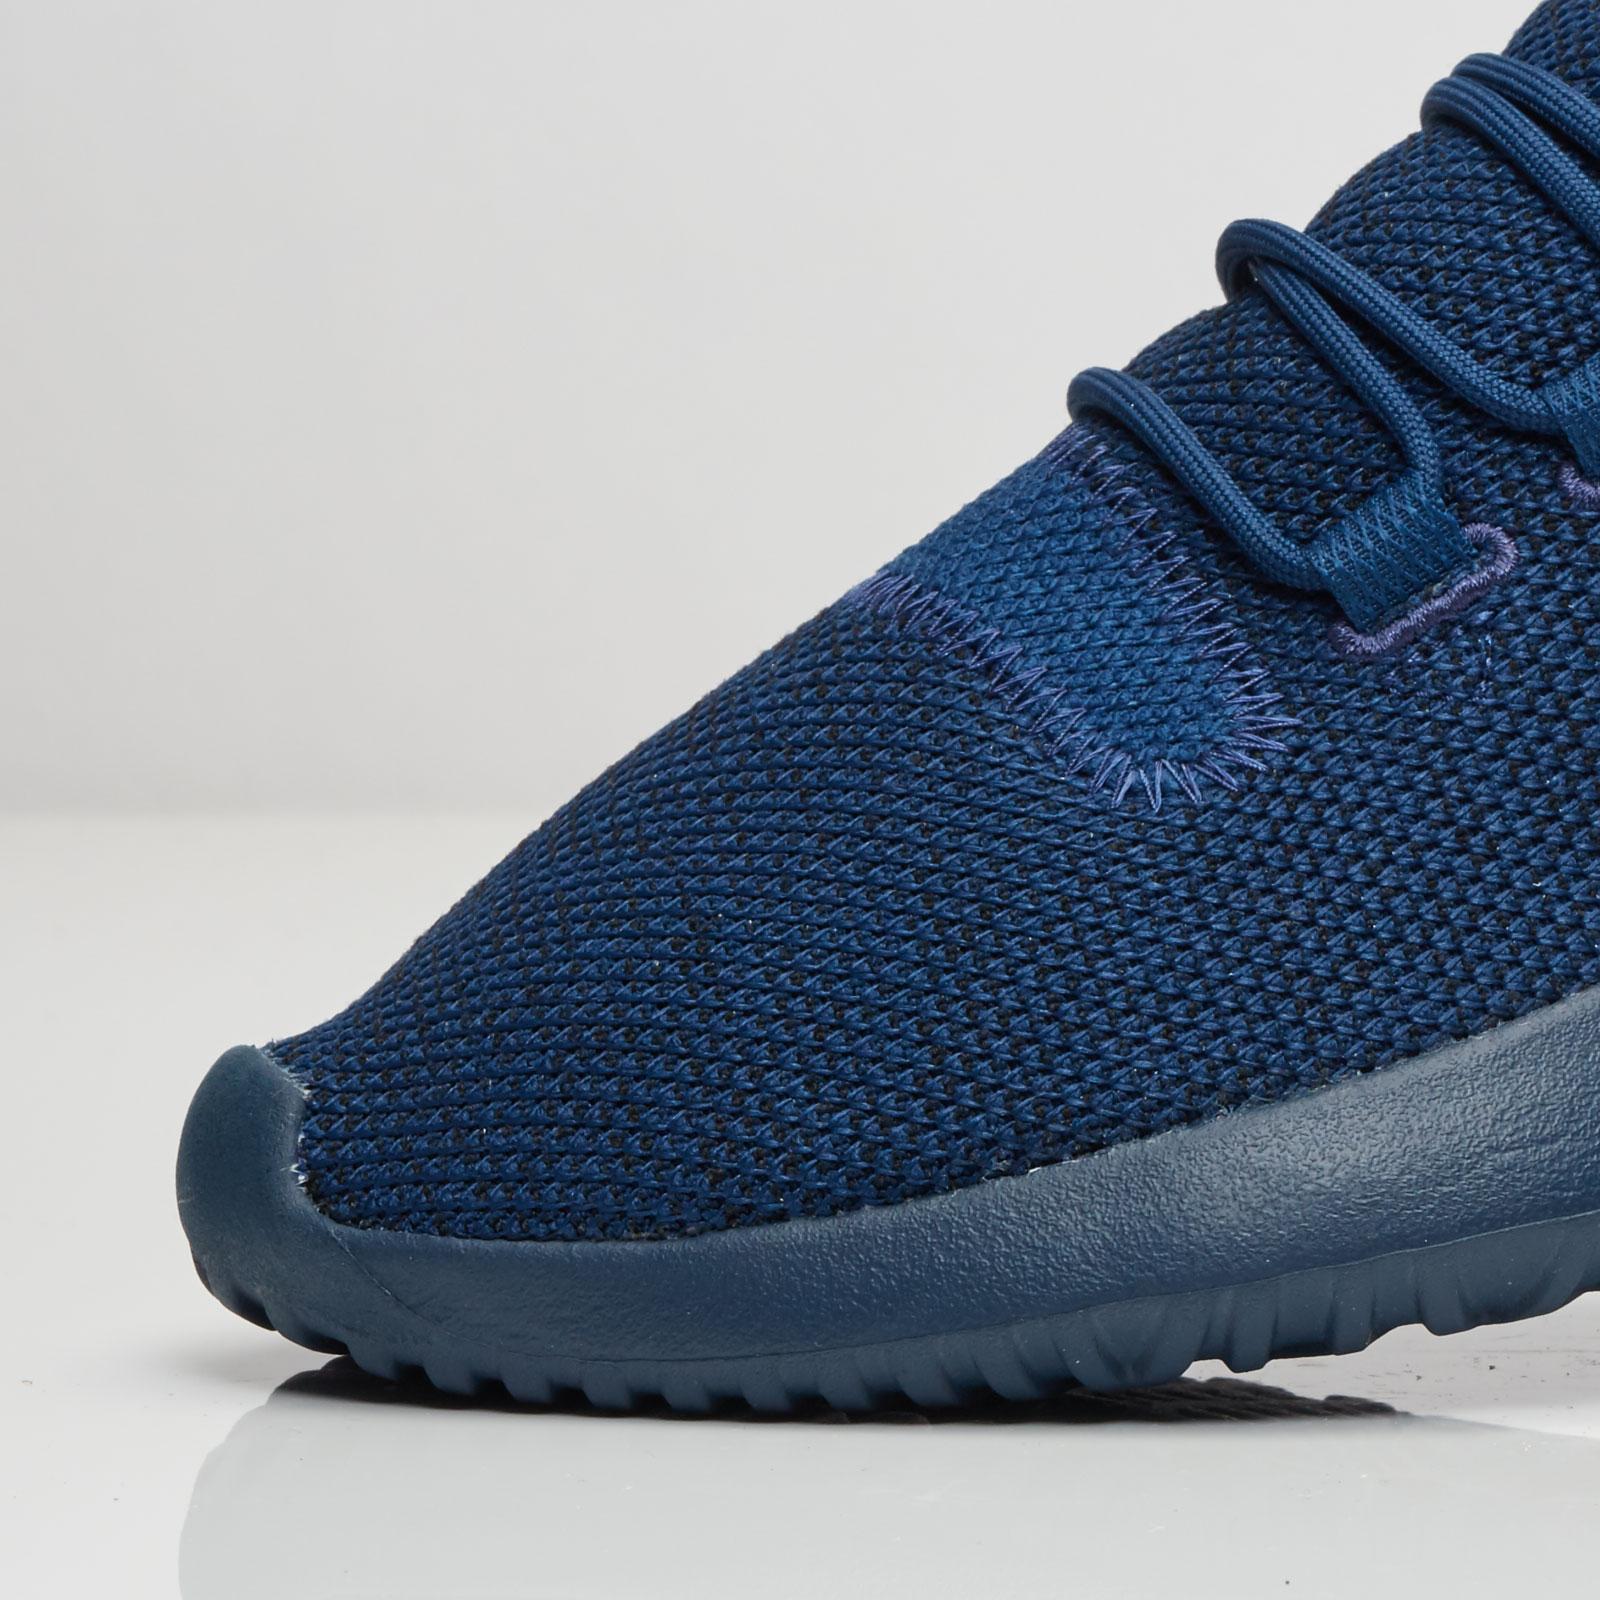 cheap for discount e1047 0c7de adidas Tubular Shadow Knit - Bb8825 - Sneakersnstuff ...